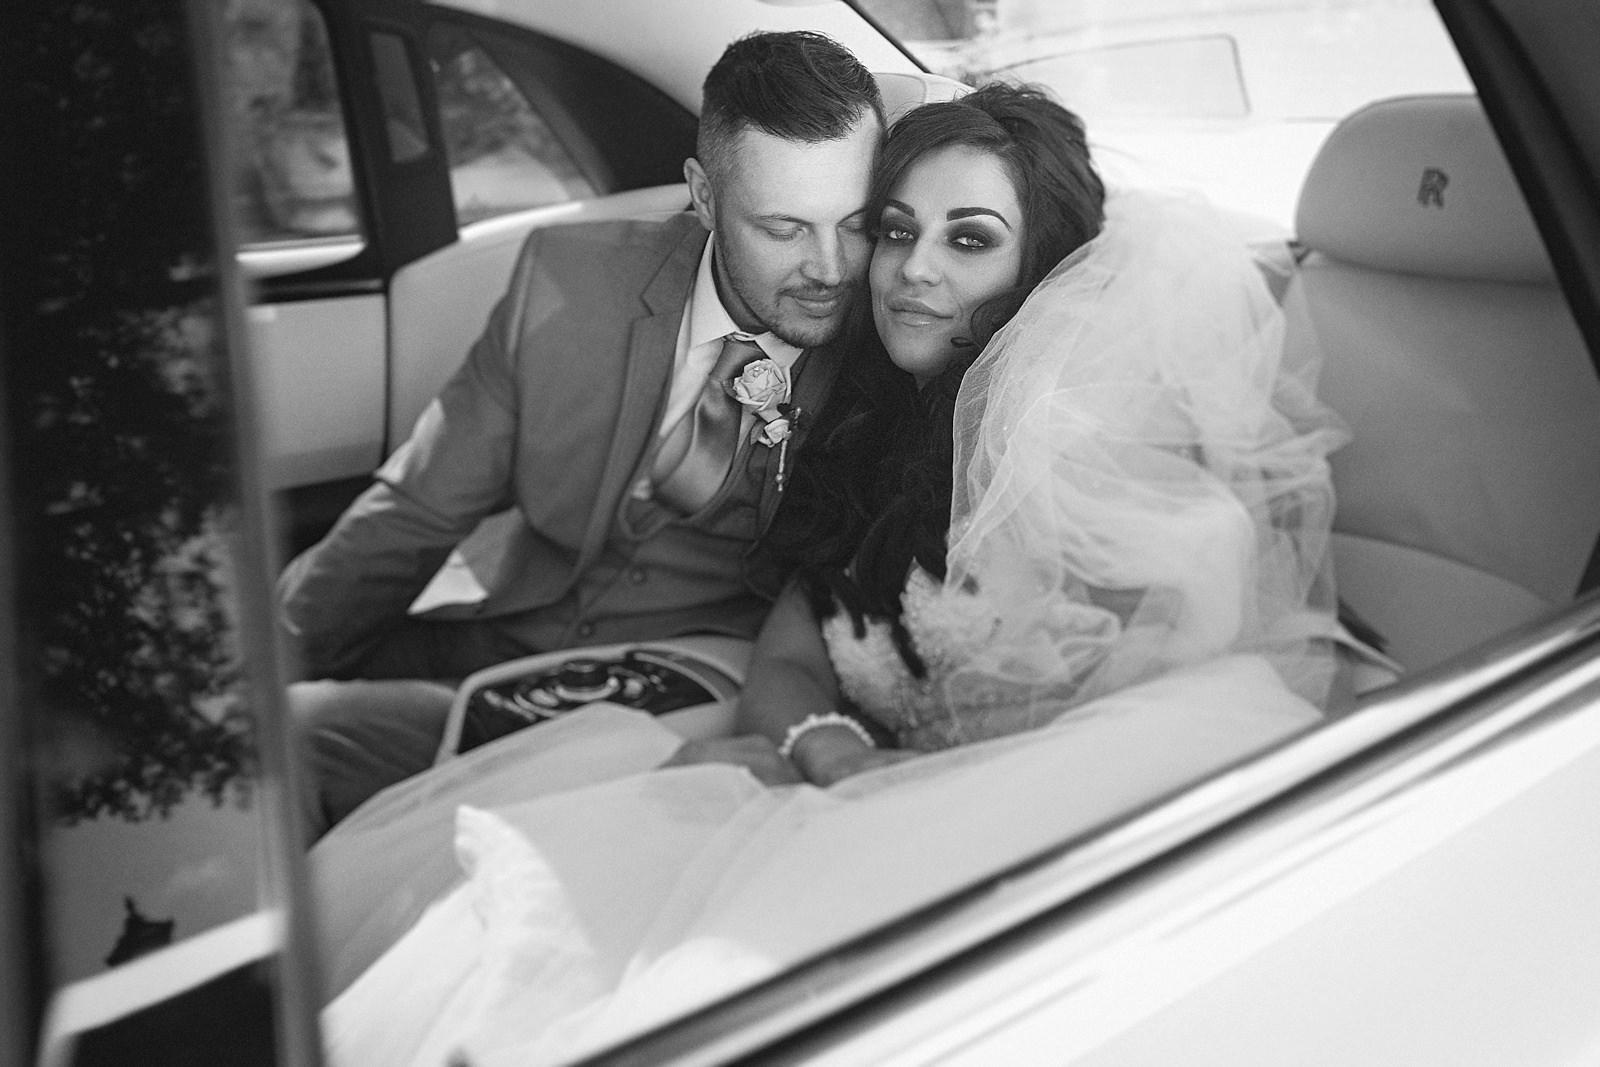 Galia lahav haute couture Giselle dress - West Tower Wedding Photography by Lancashire wedding Photographer Wes Simpson_0024